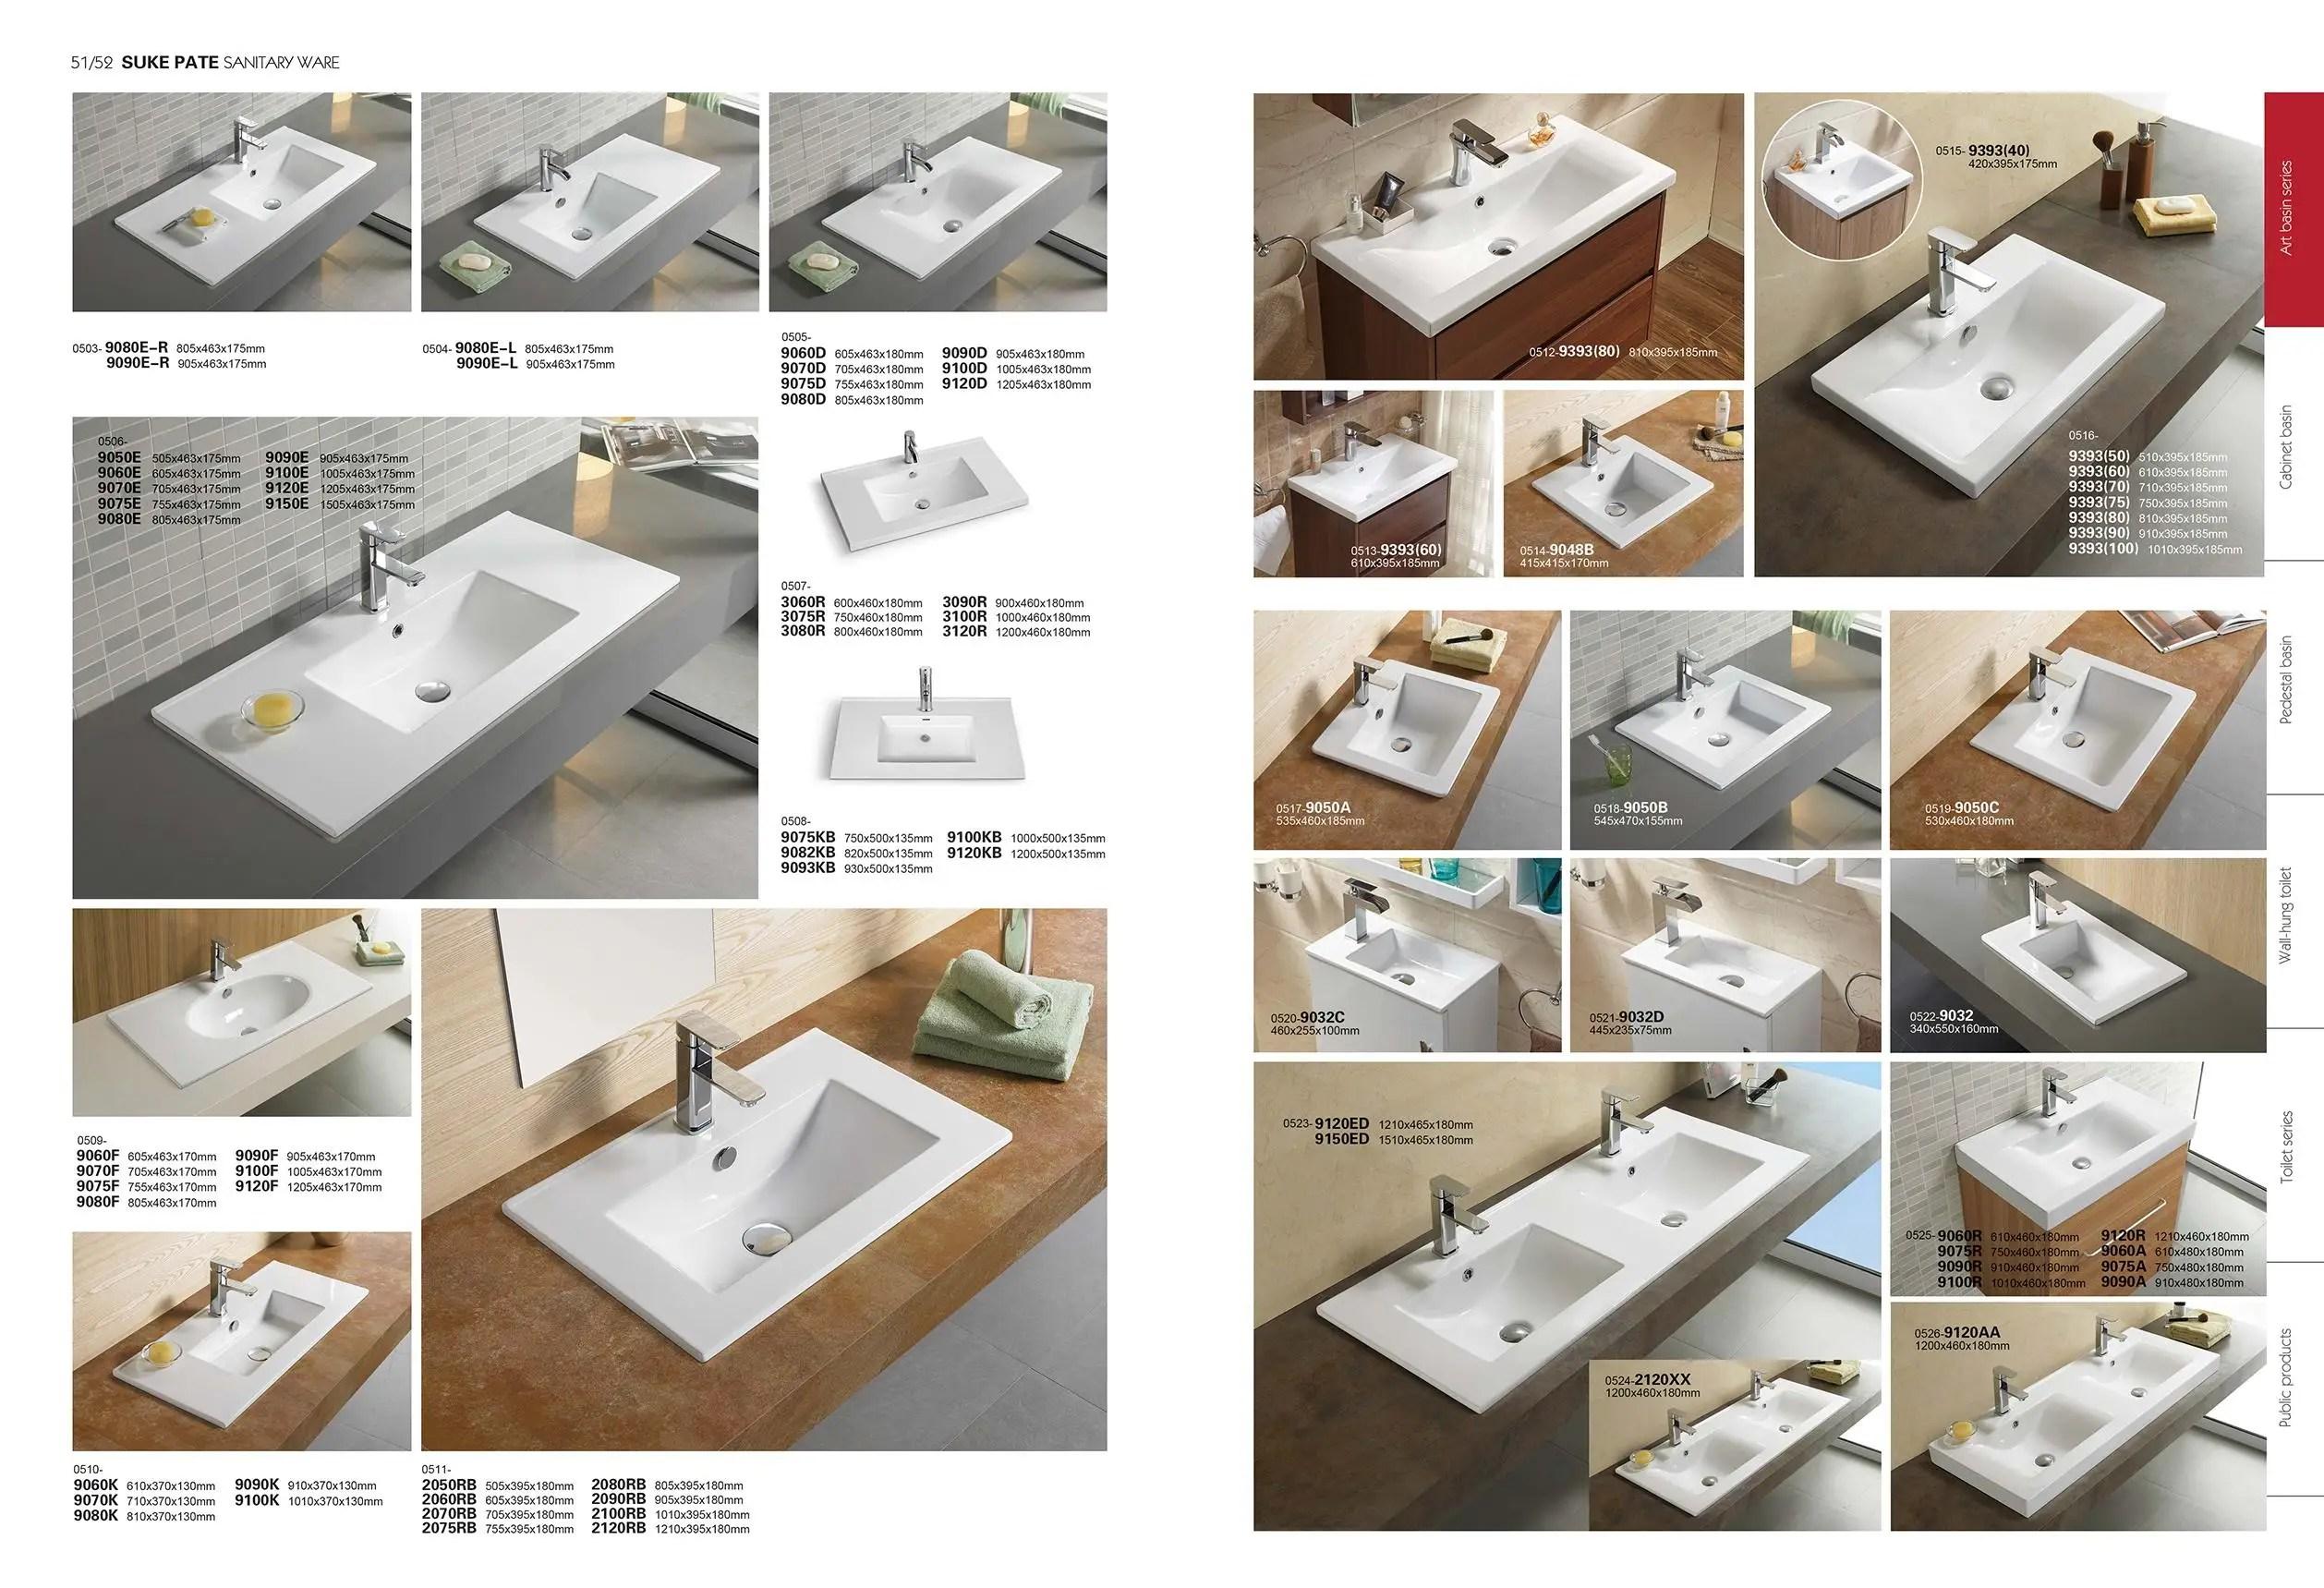 Pate Sanitary Ware Manufacturer Matt Blue Grey Ceramic Wash Basin Europe Bathroom Vanity Double Sink Buy Double Sink Bathroom Double Sink Double Bowl Bathroom Sink Product On Alibaba Com